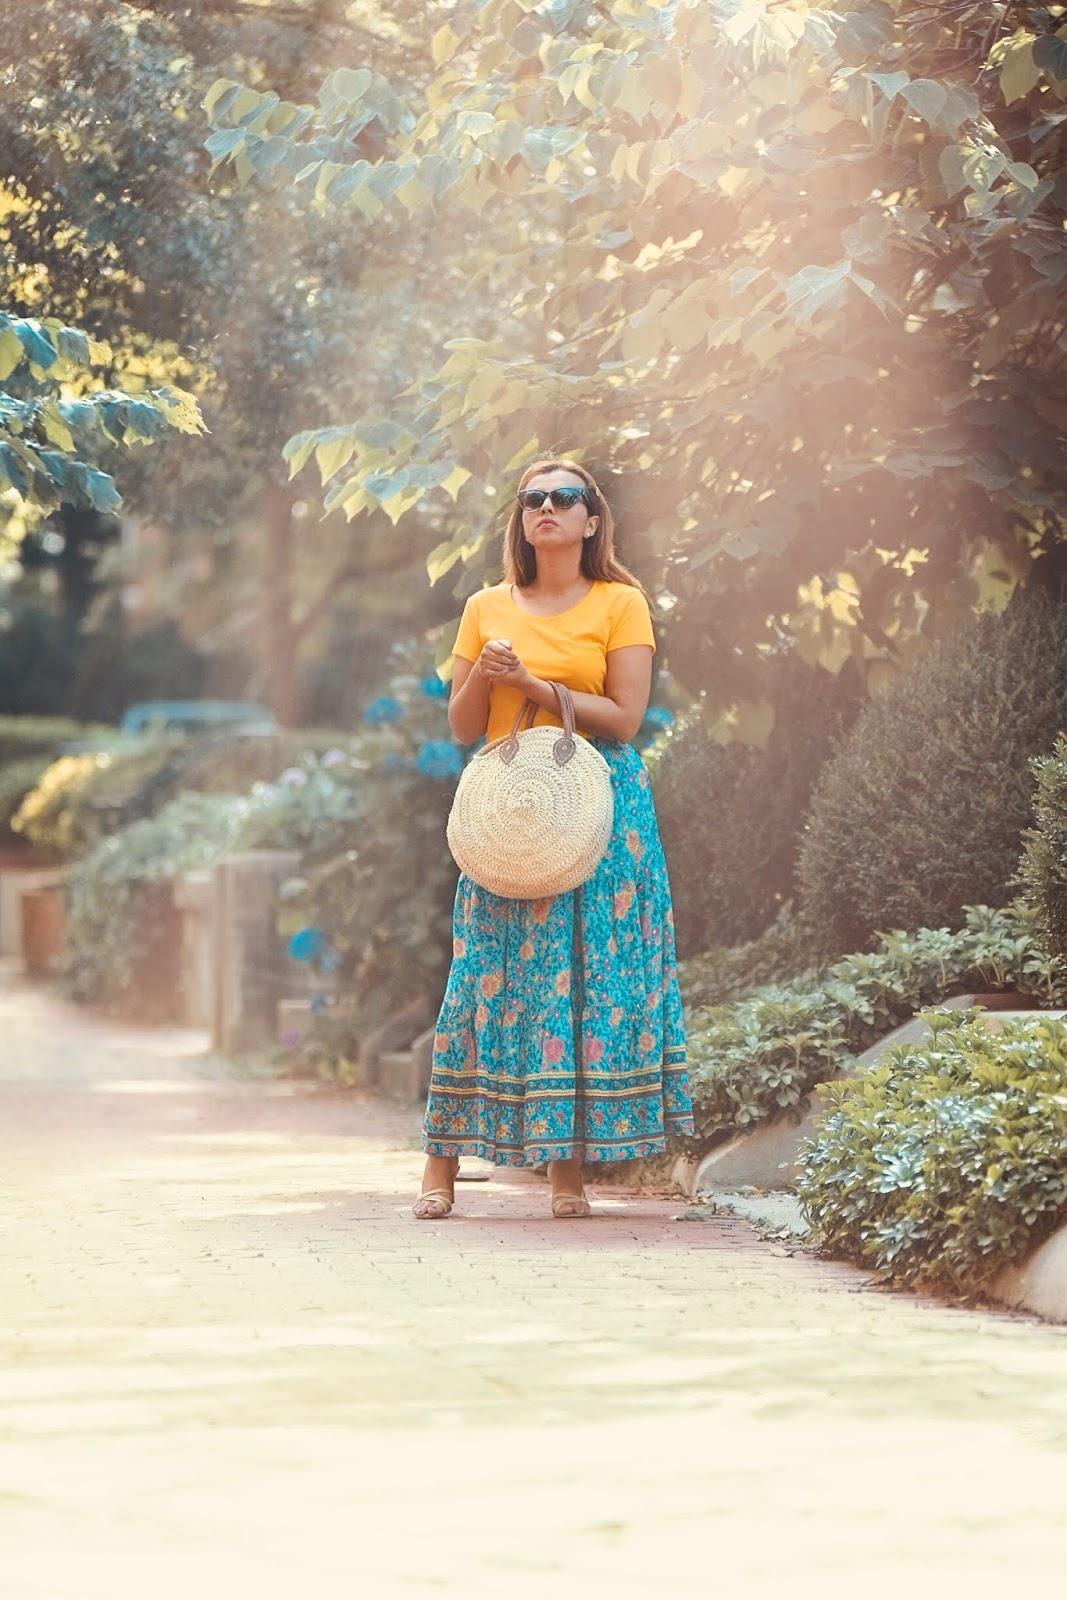 Blue Boho Floral-Print Elastic Waist Maxi Skirt -mariestilo-lookbookstore-armandhugon-dcblogger-fashionblogger-strawbags-